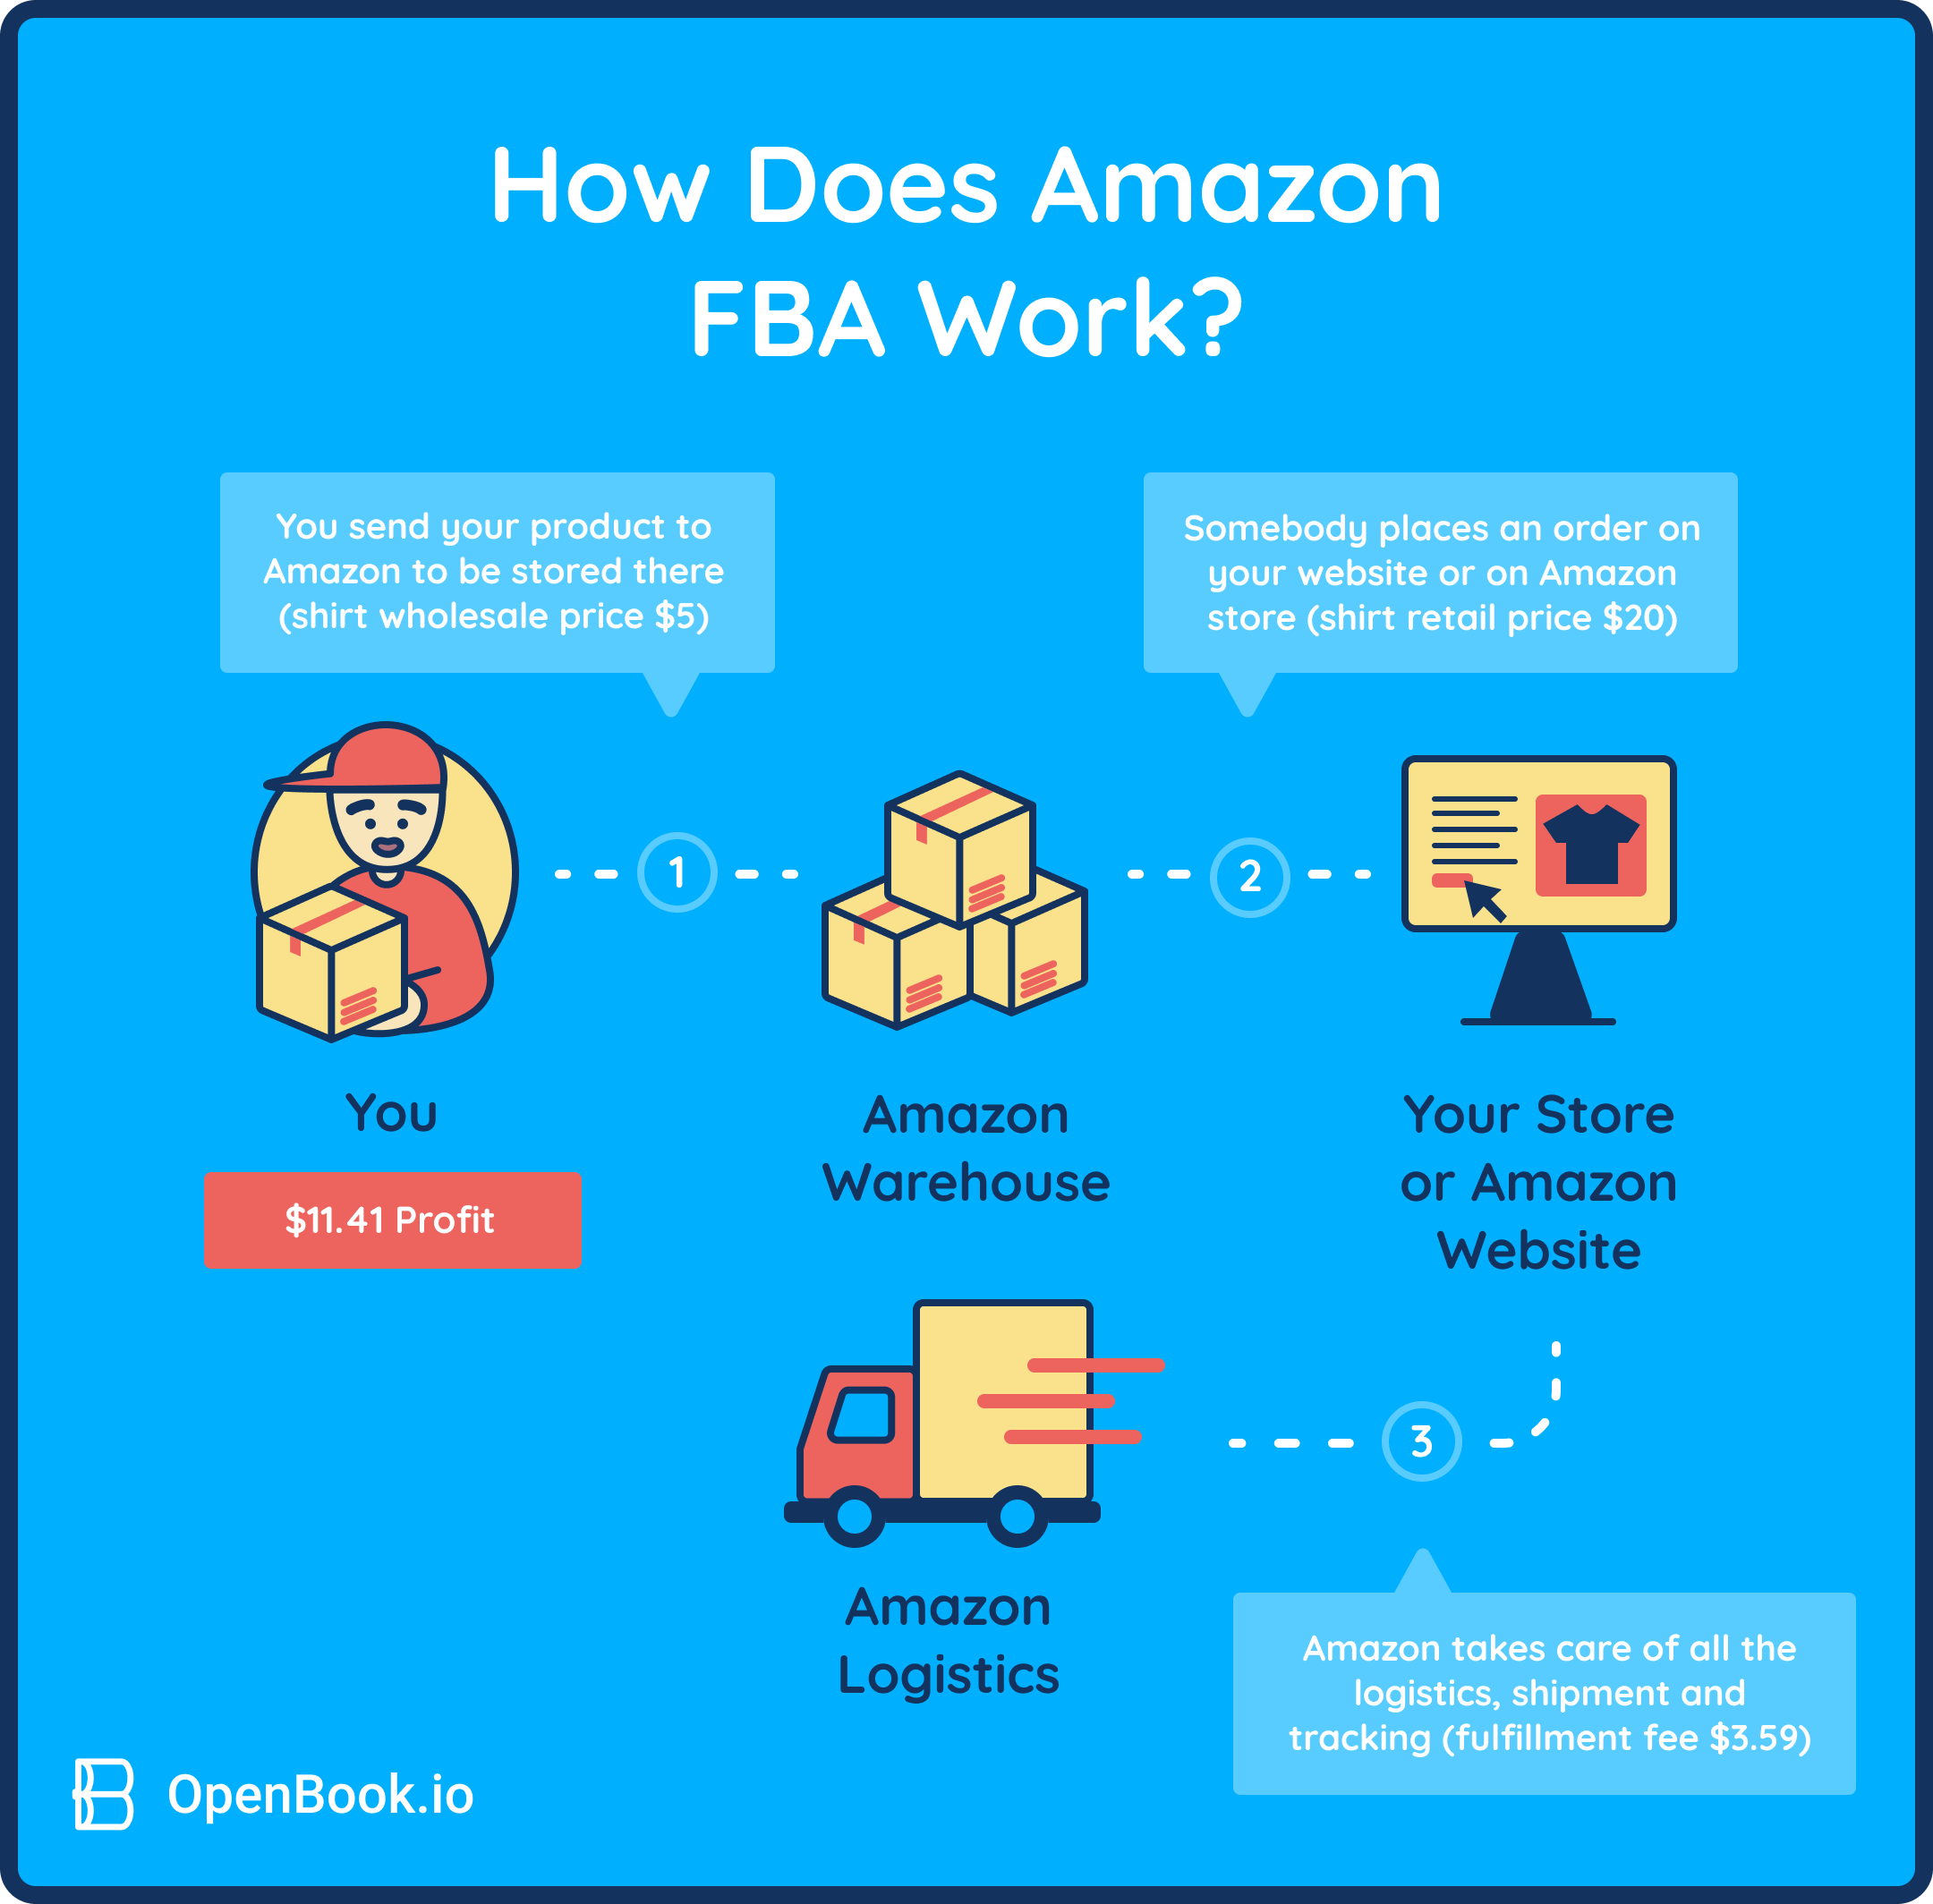 How does Amazon FBA work?